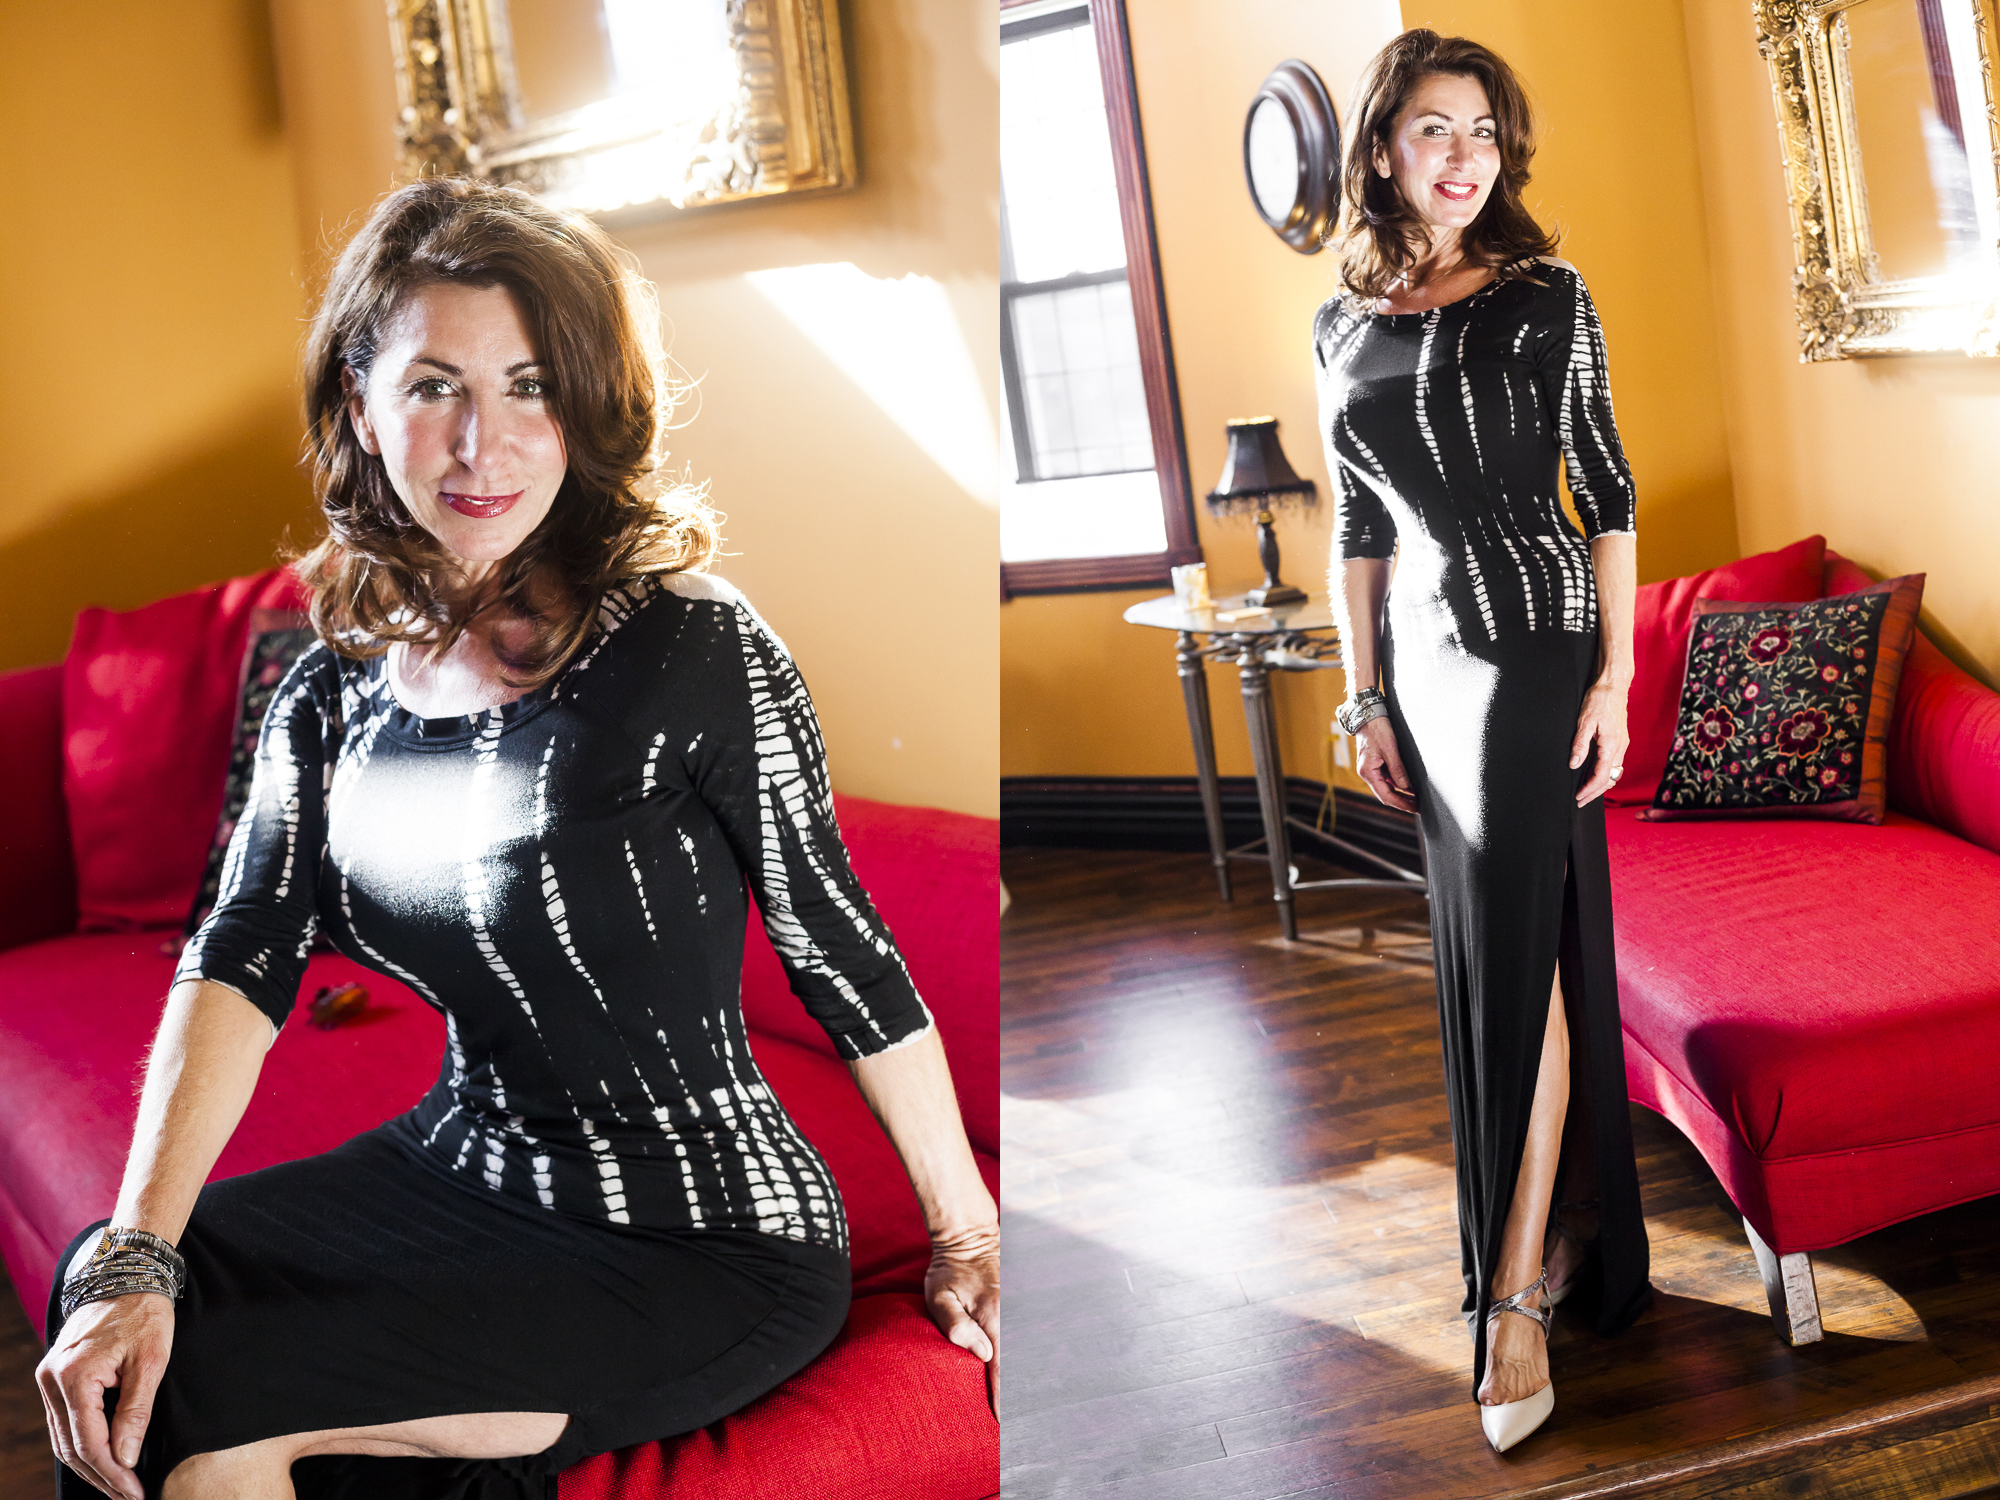 Edmonton-womens-upscale-fashion-boutique-spring-2015-bella-maas